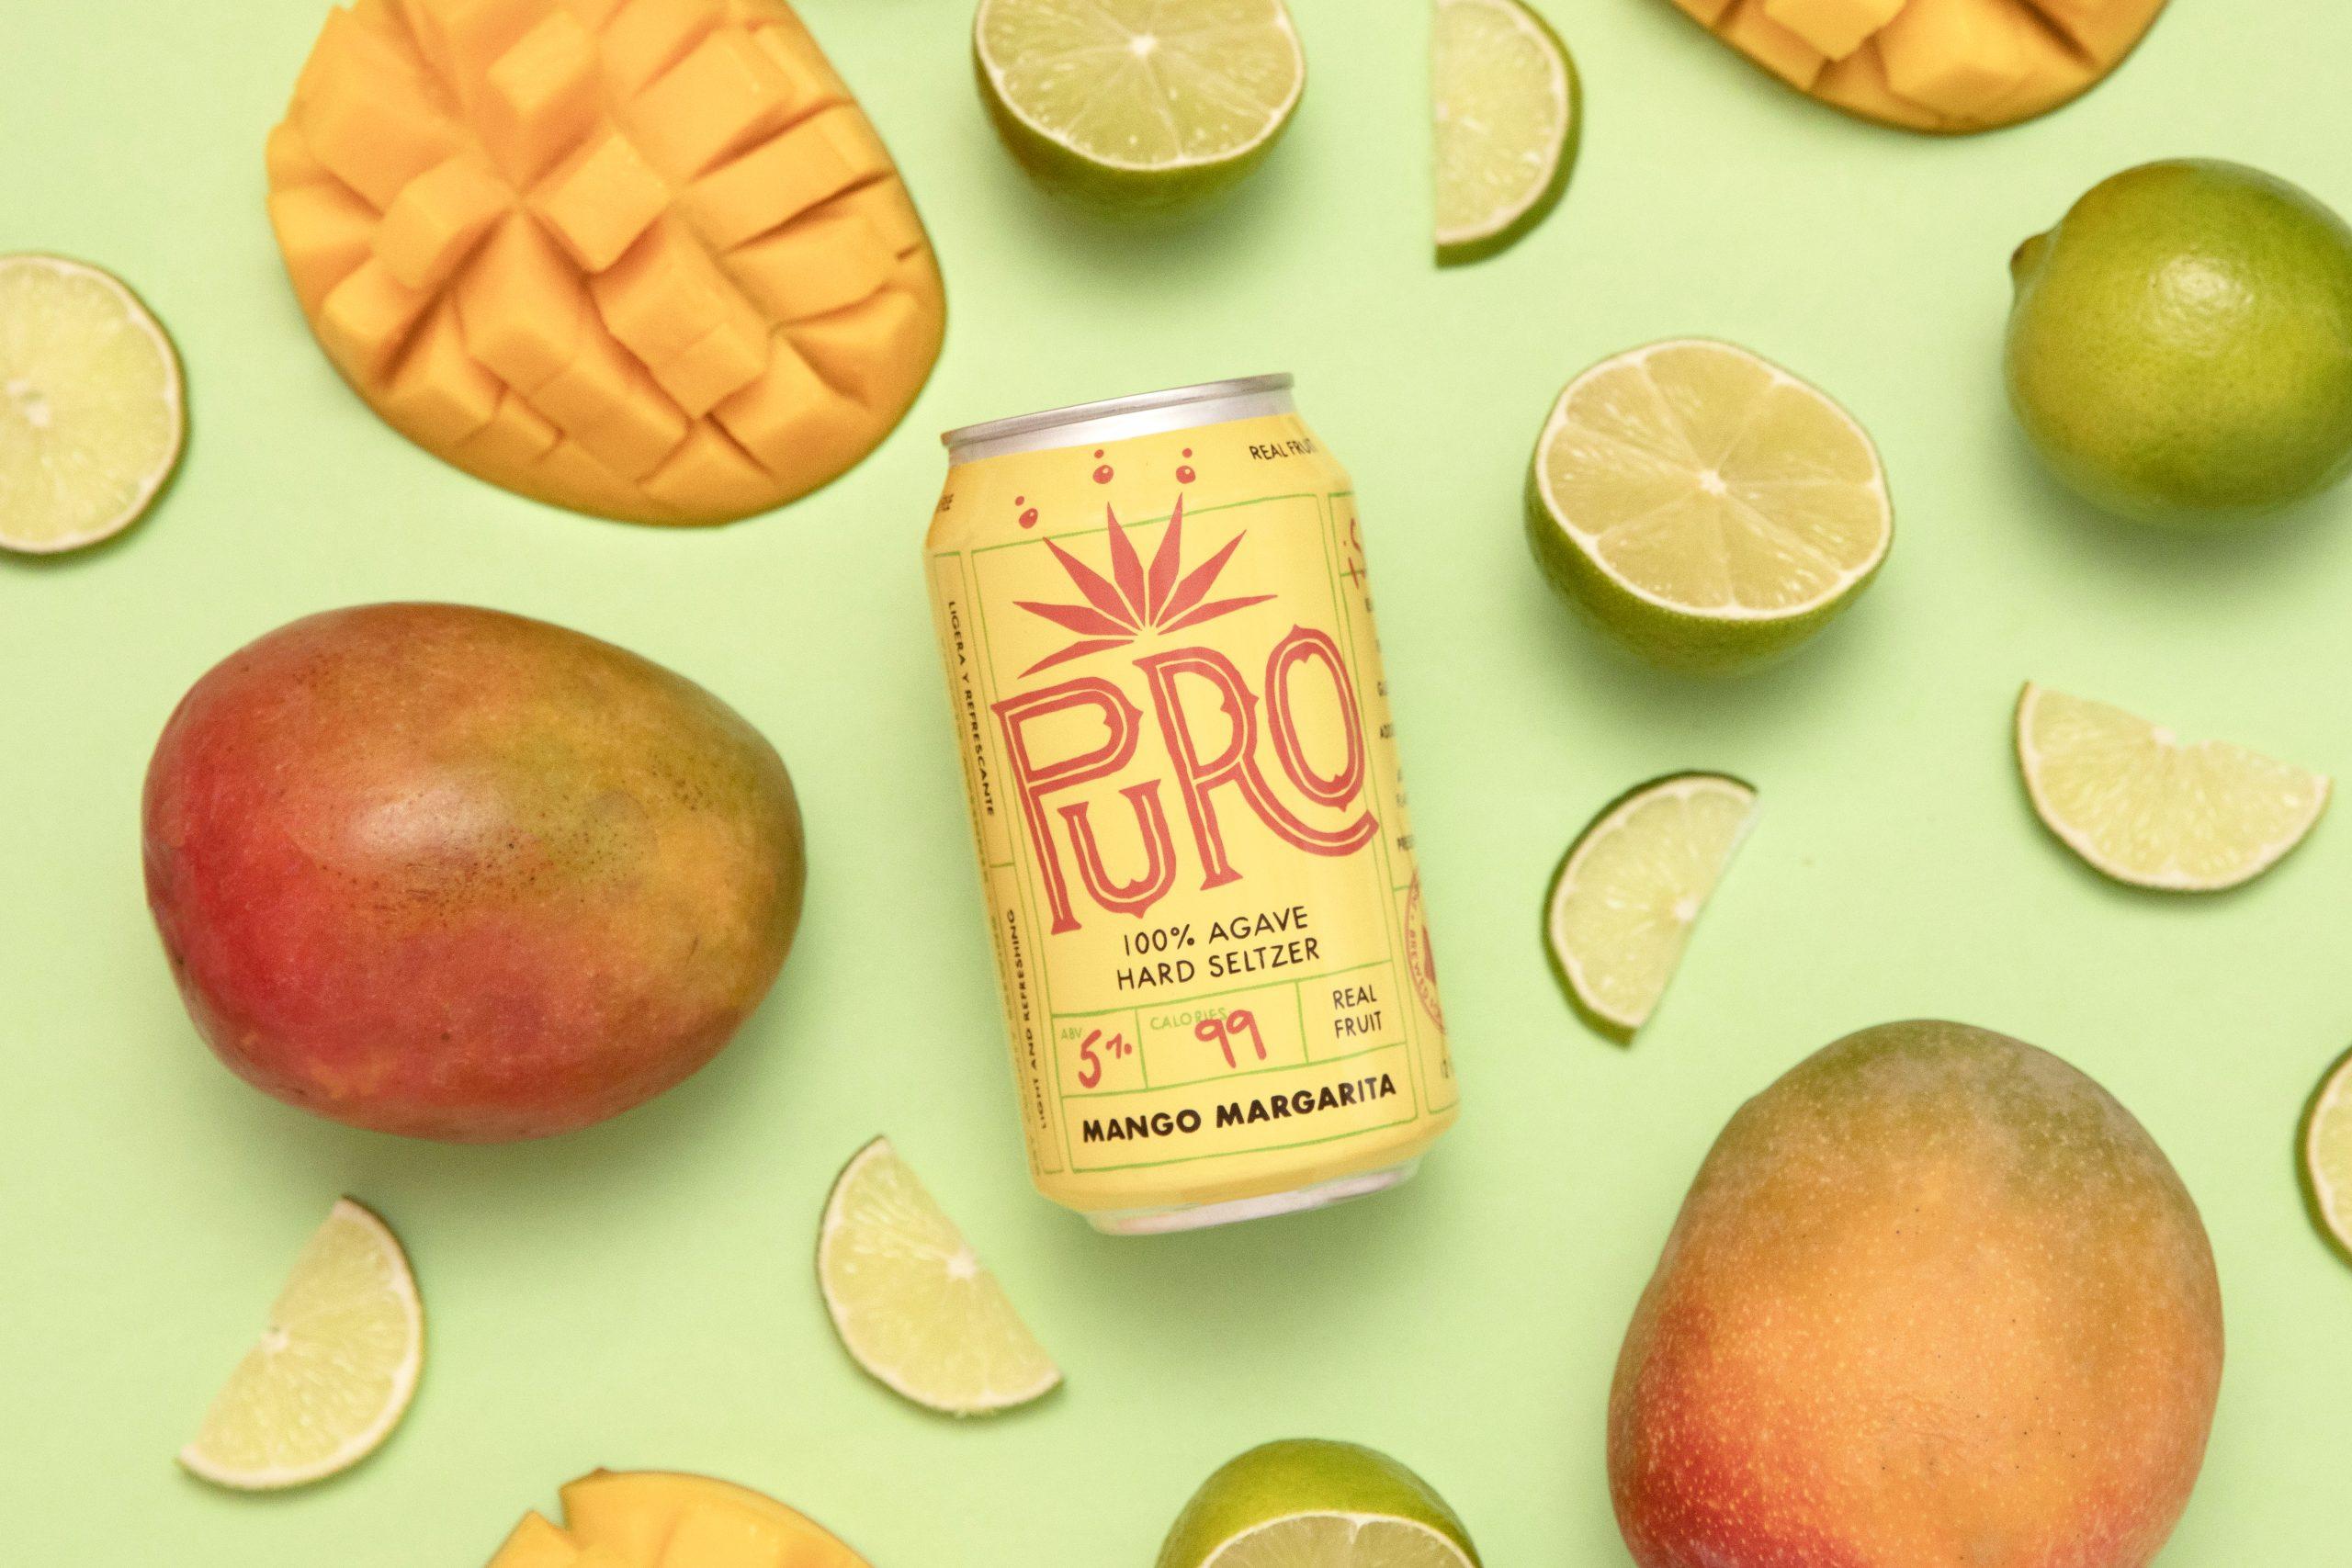 Dry County Brewing Puro Mango Margarita Agave Seltzer